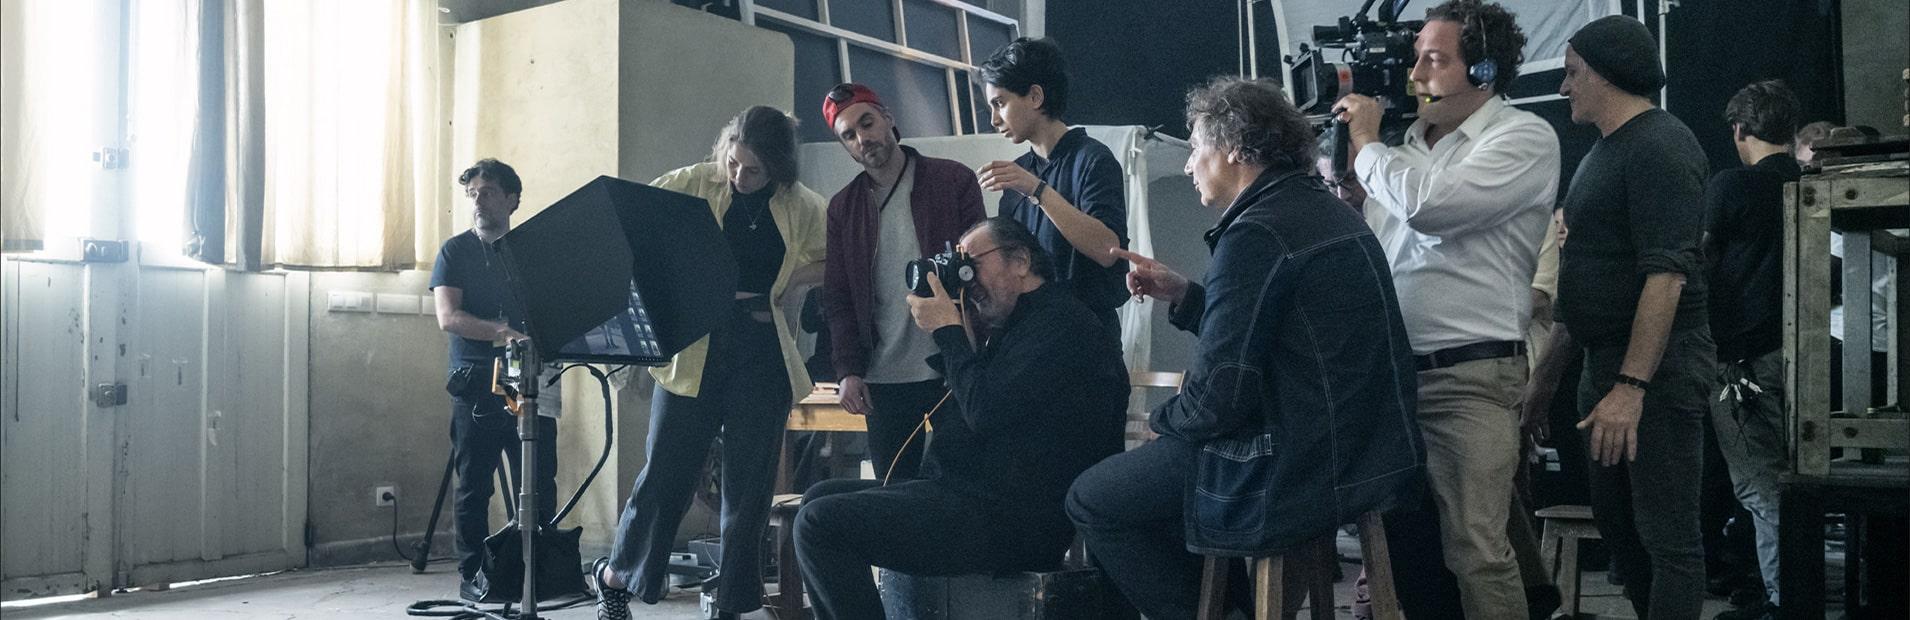 Calendario 2019 Attrici.Looking For Juliet Ecco Il Cast Del Calendario Pirelli 2020